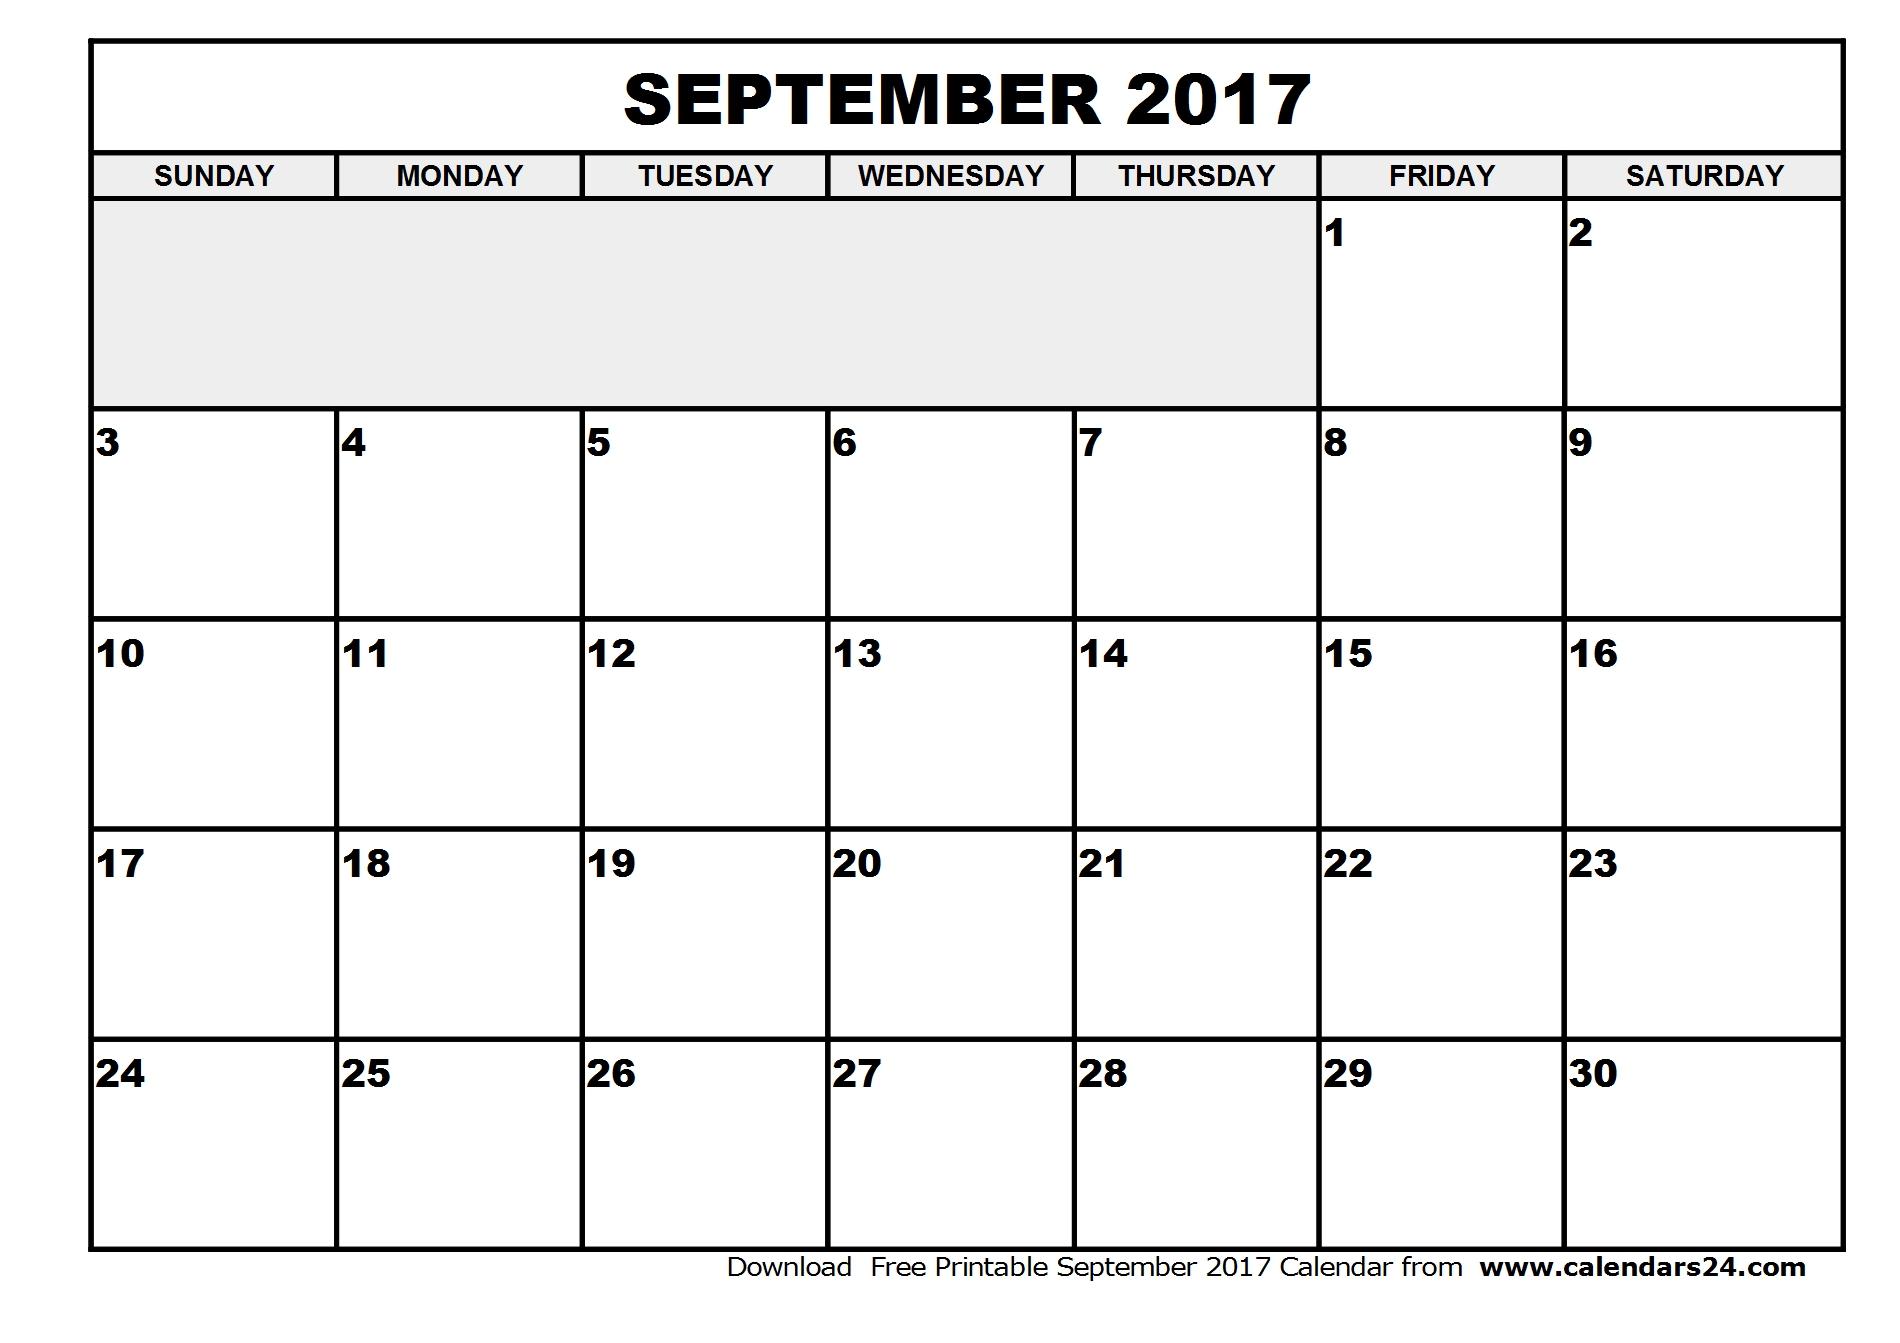 September 2017 Calendar With US Holidays